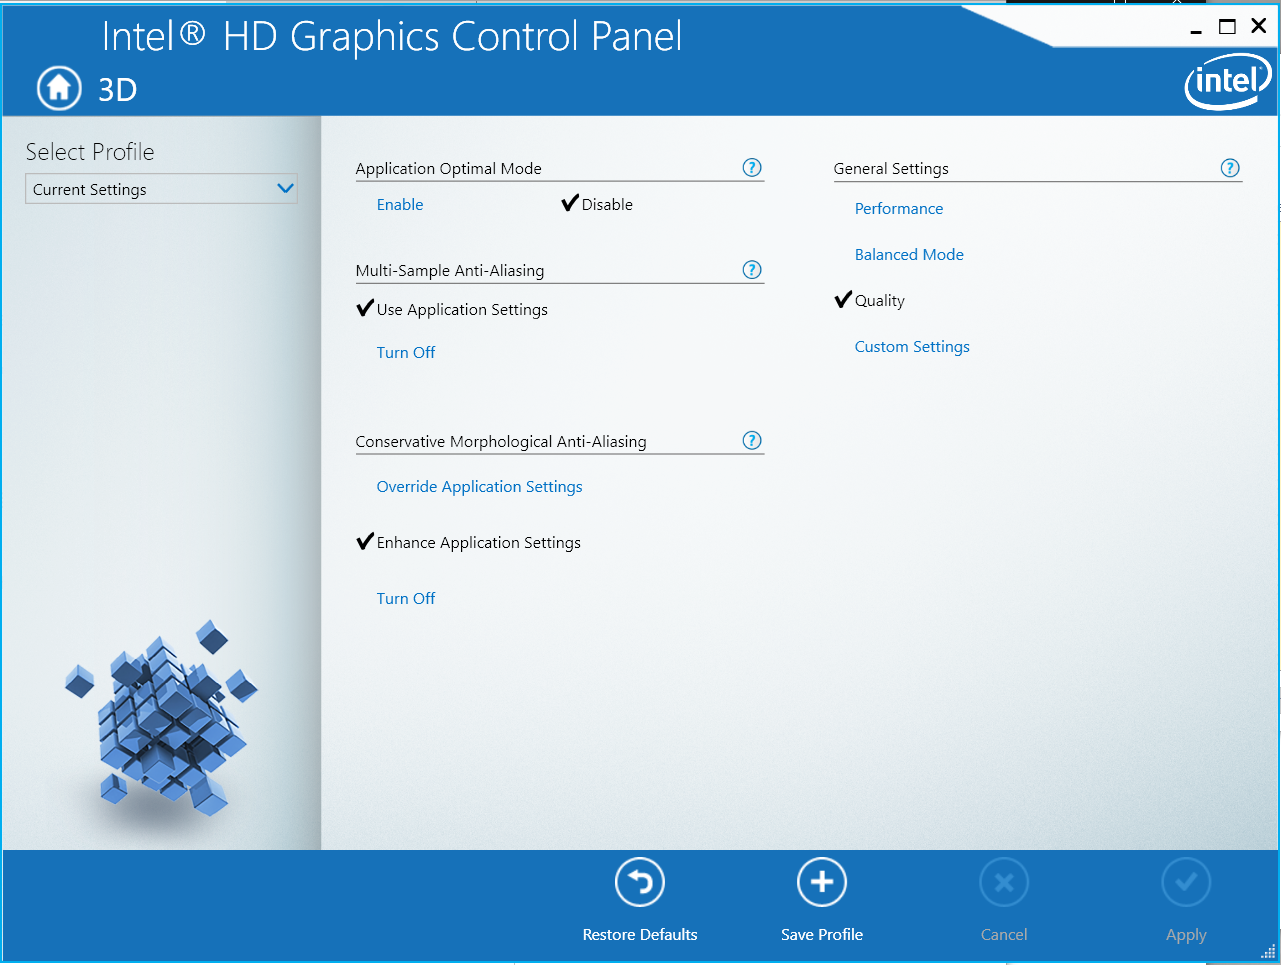 intel hd graphics 4600 xp driver download